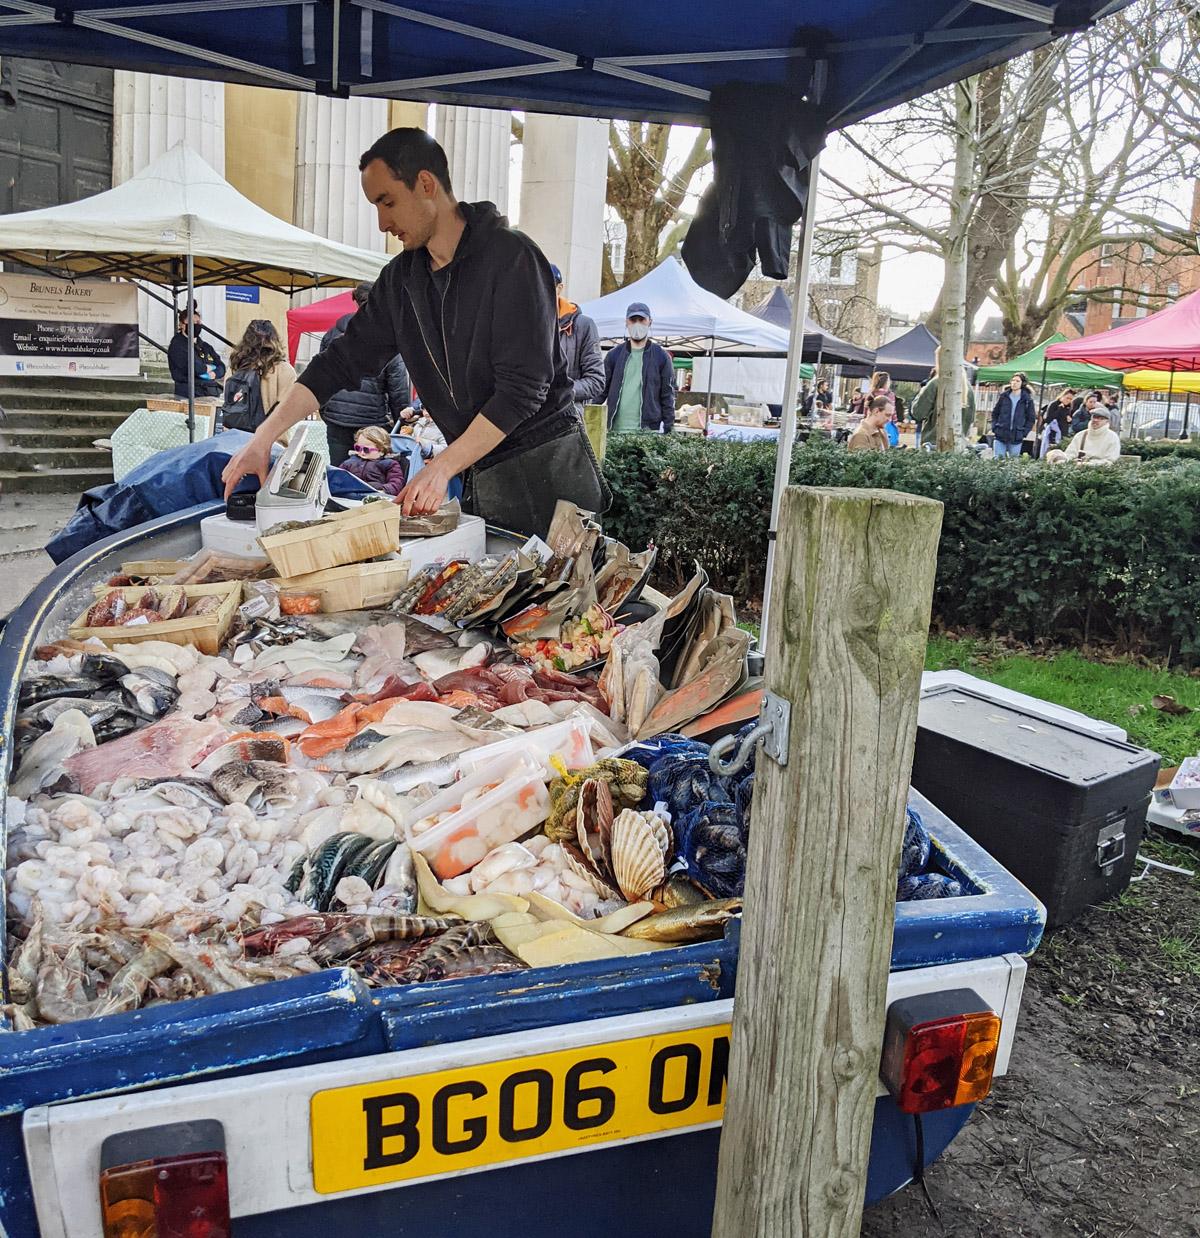 Potter Street Fishmongers